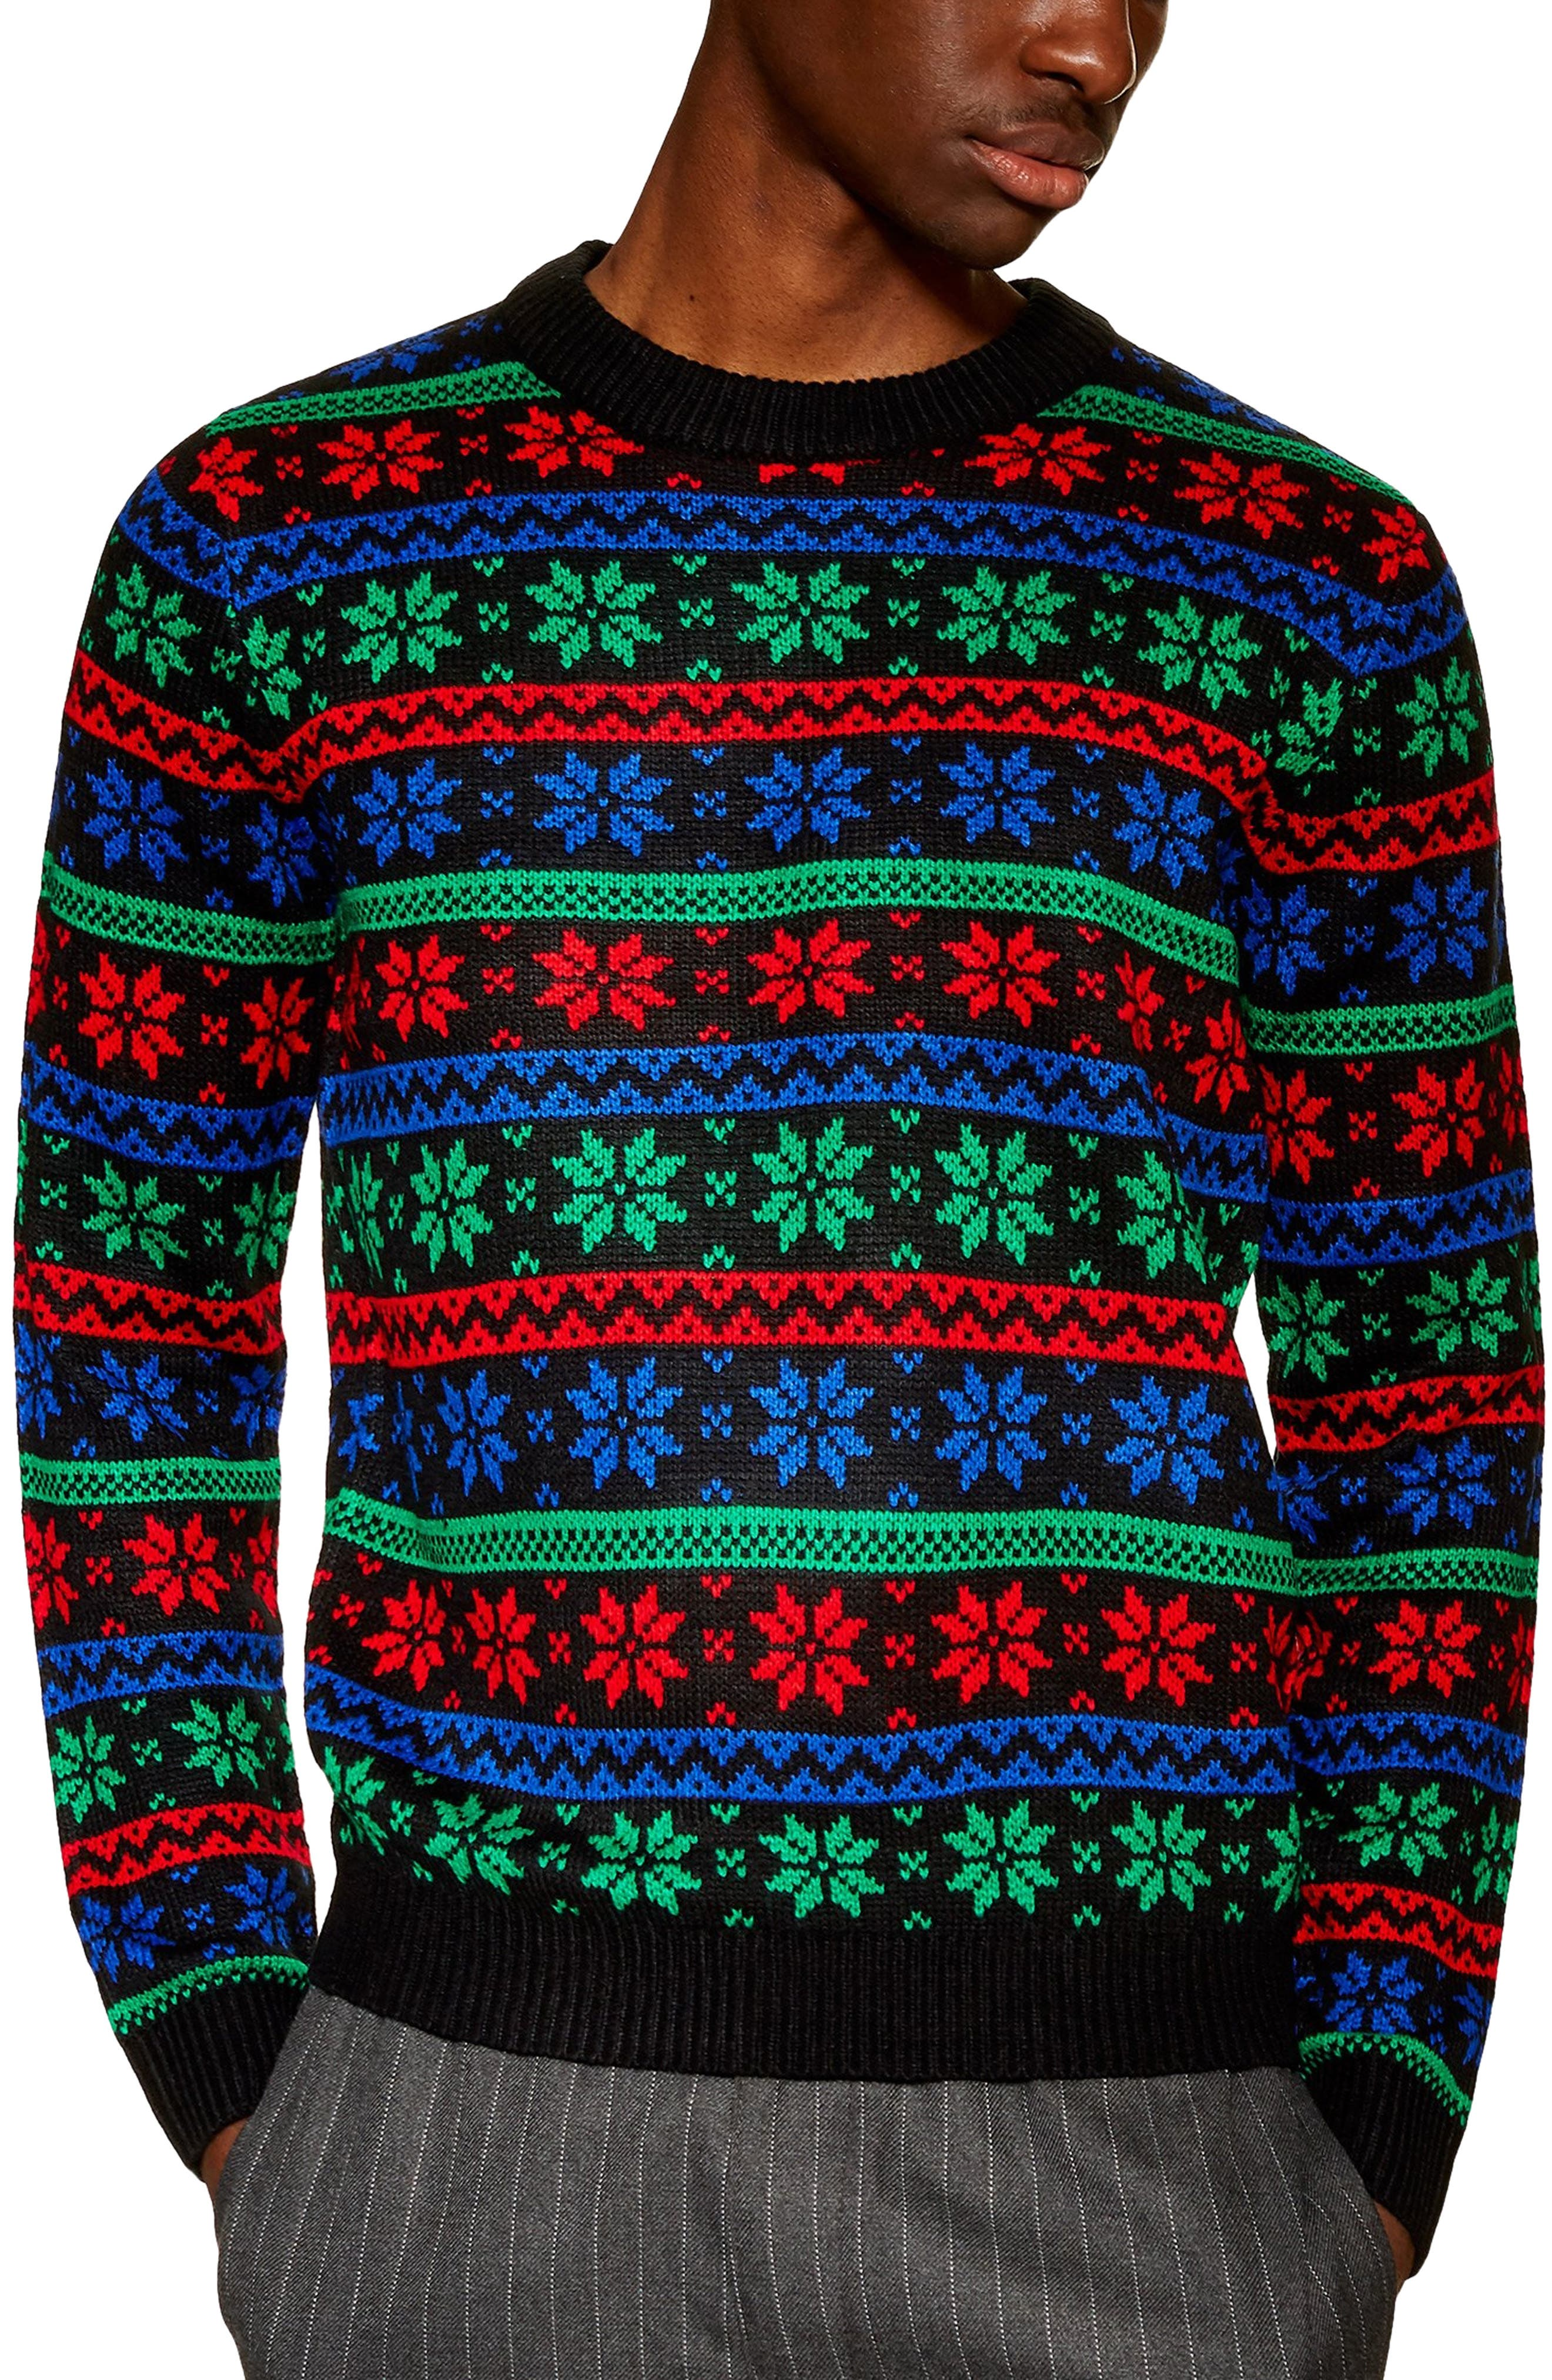 Snowflake Sweater,                             Main thumbnail 1, color,                             BLACK MULTI